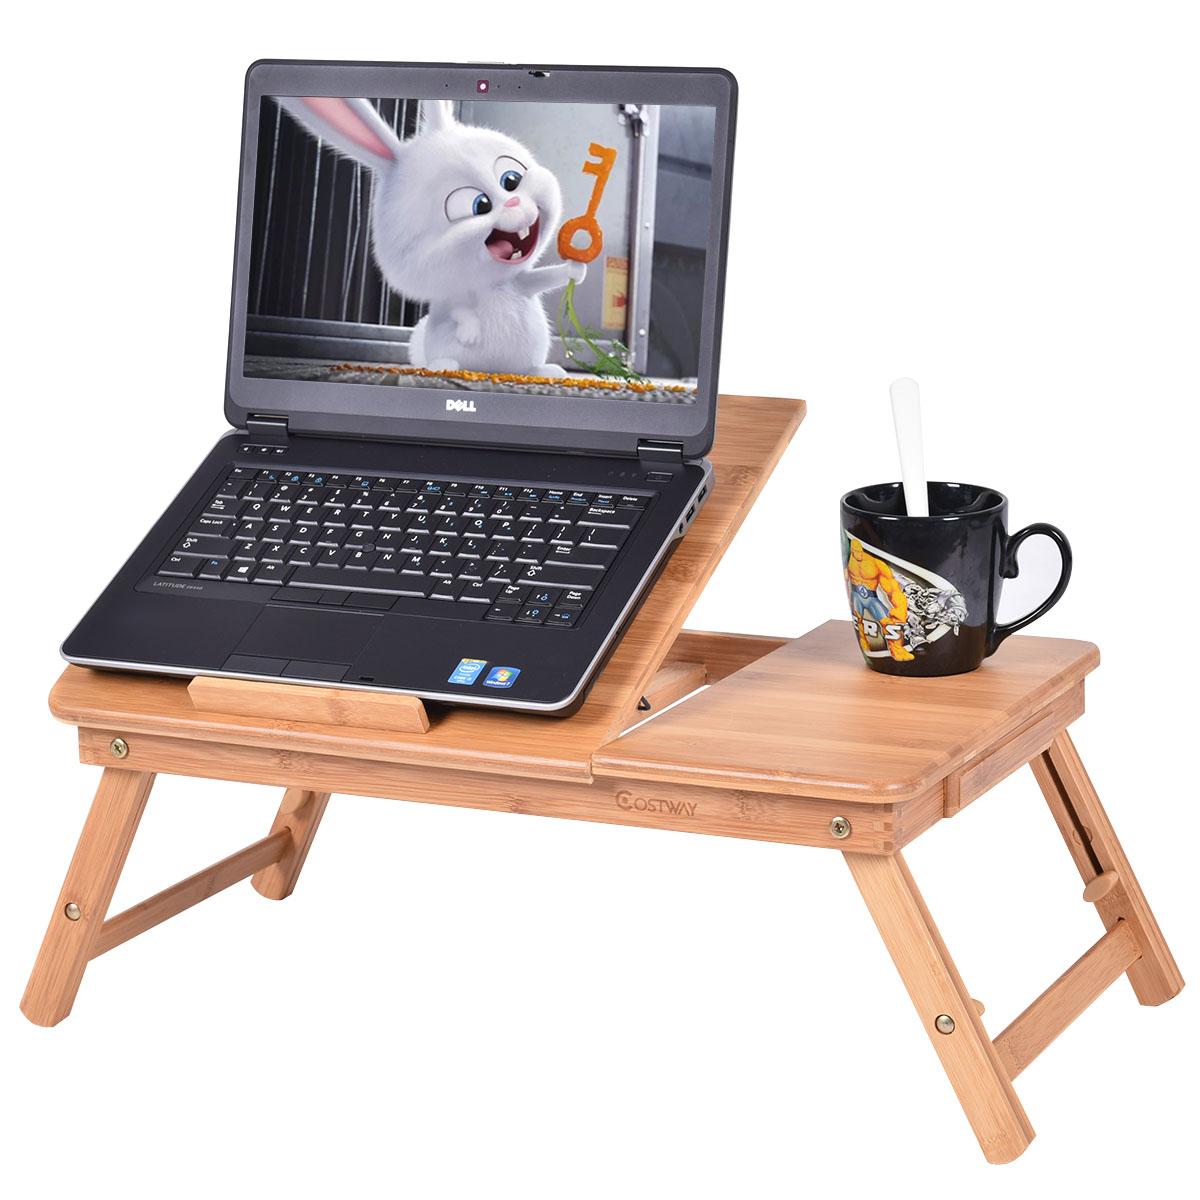 Costway Portable Bamboo Laptop Desk Table Folding